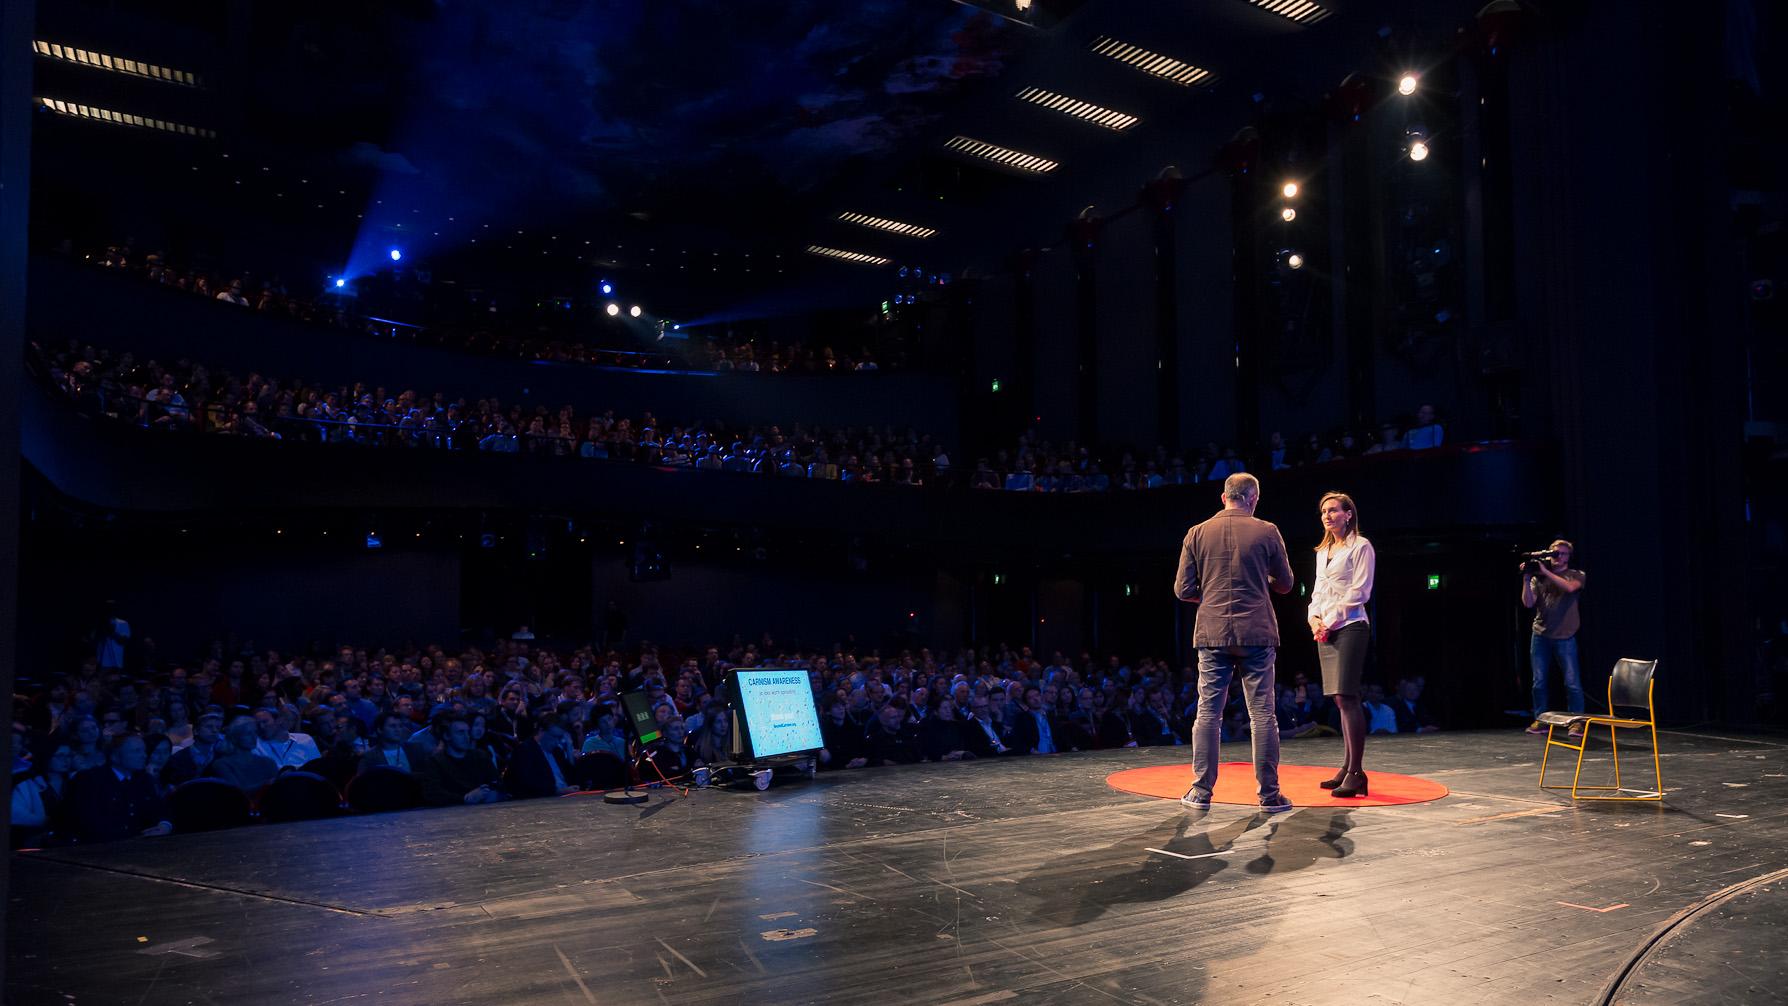 TEDx-munich_19-18-35.jpg